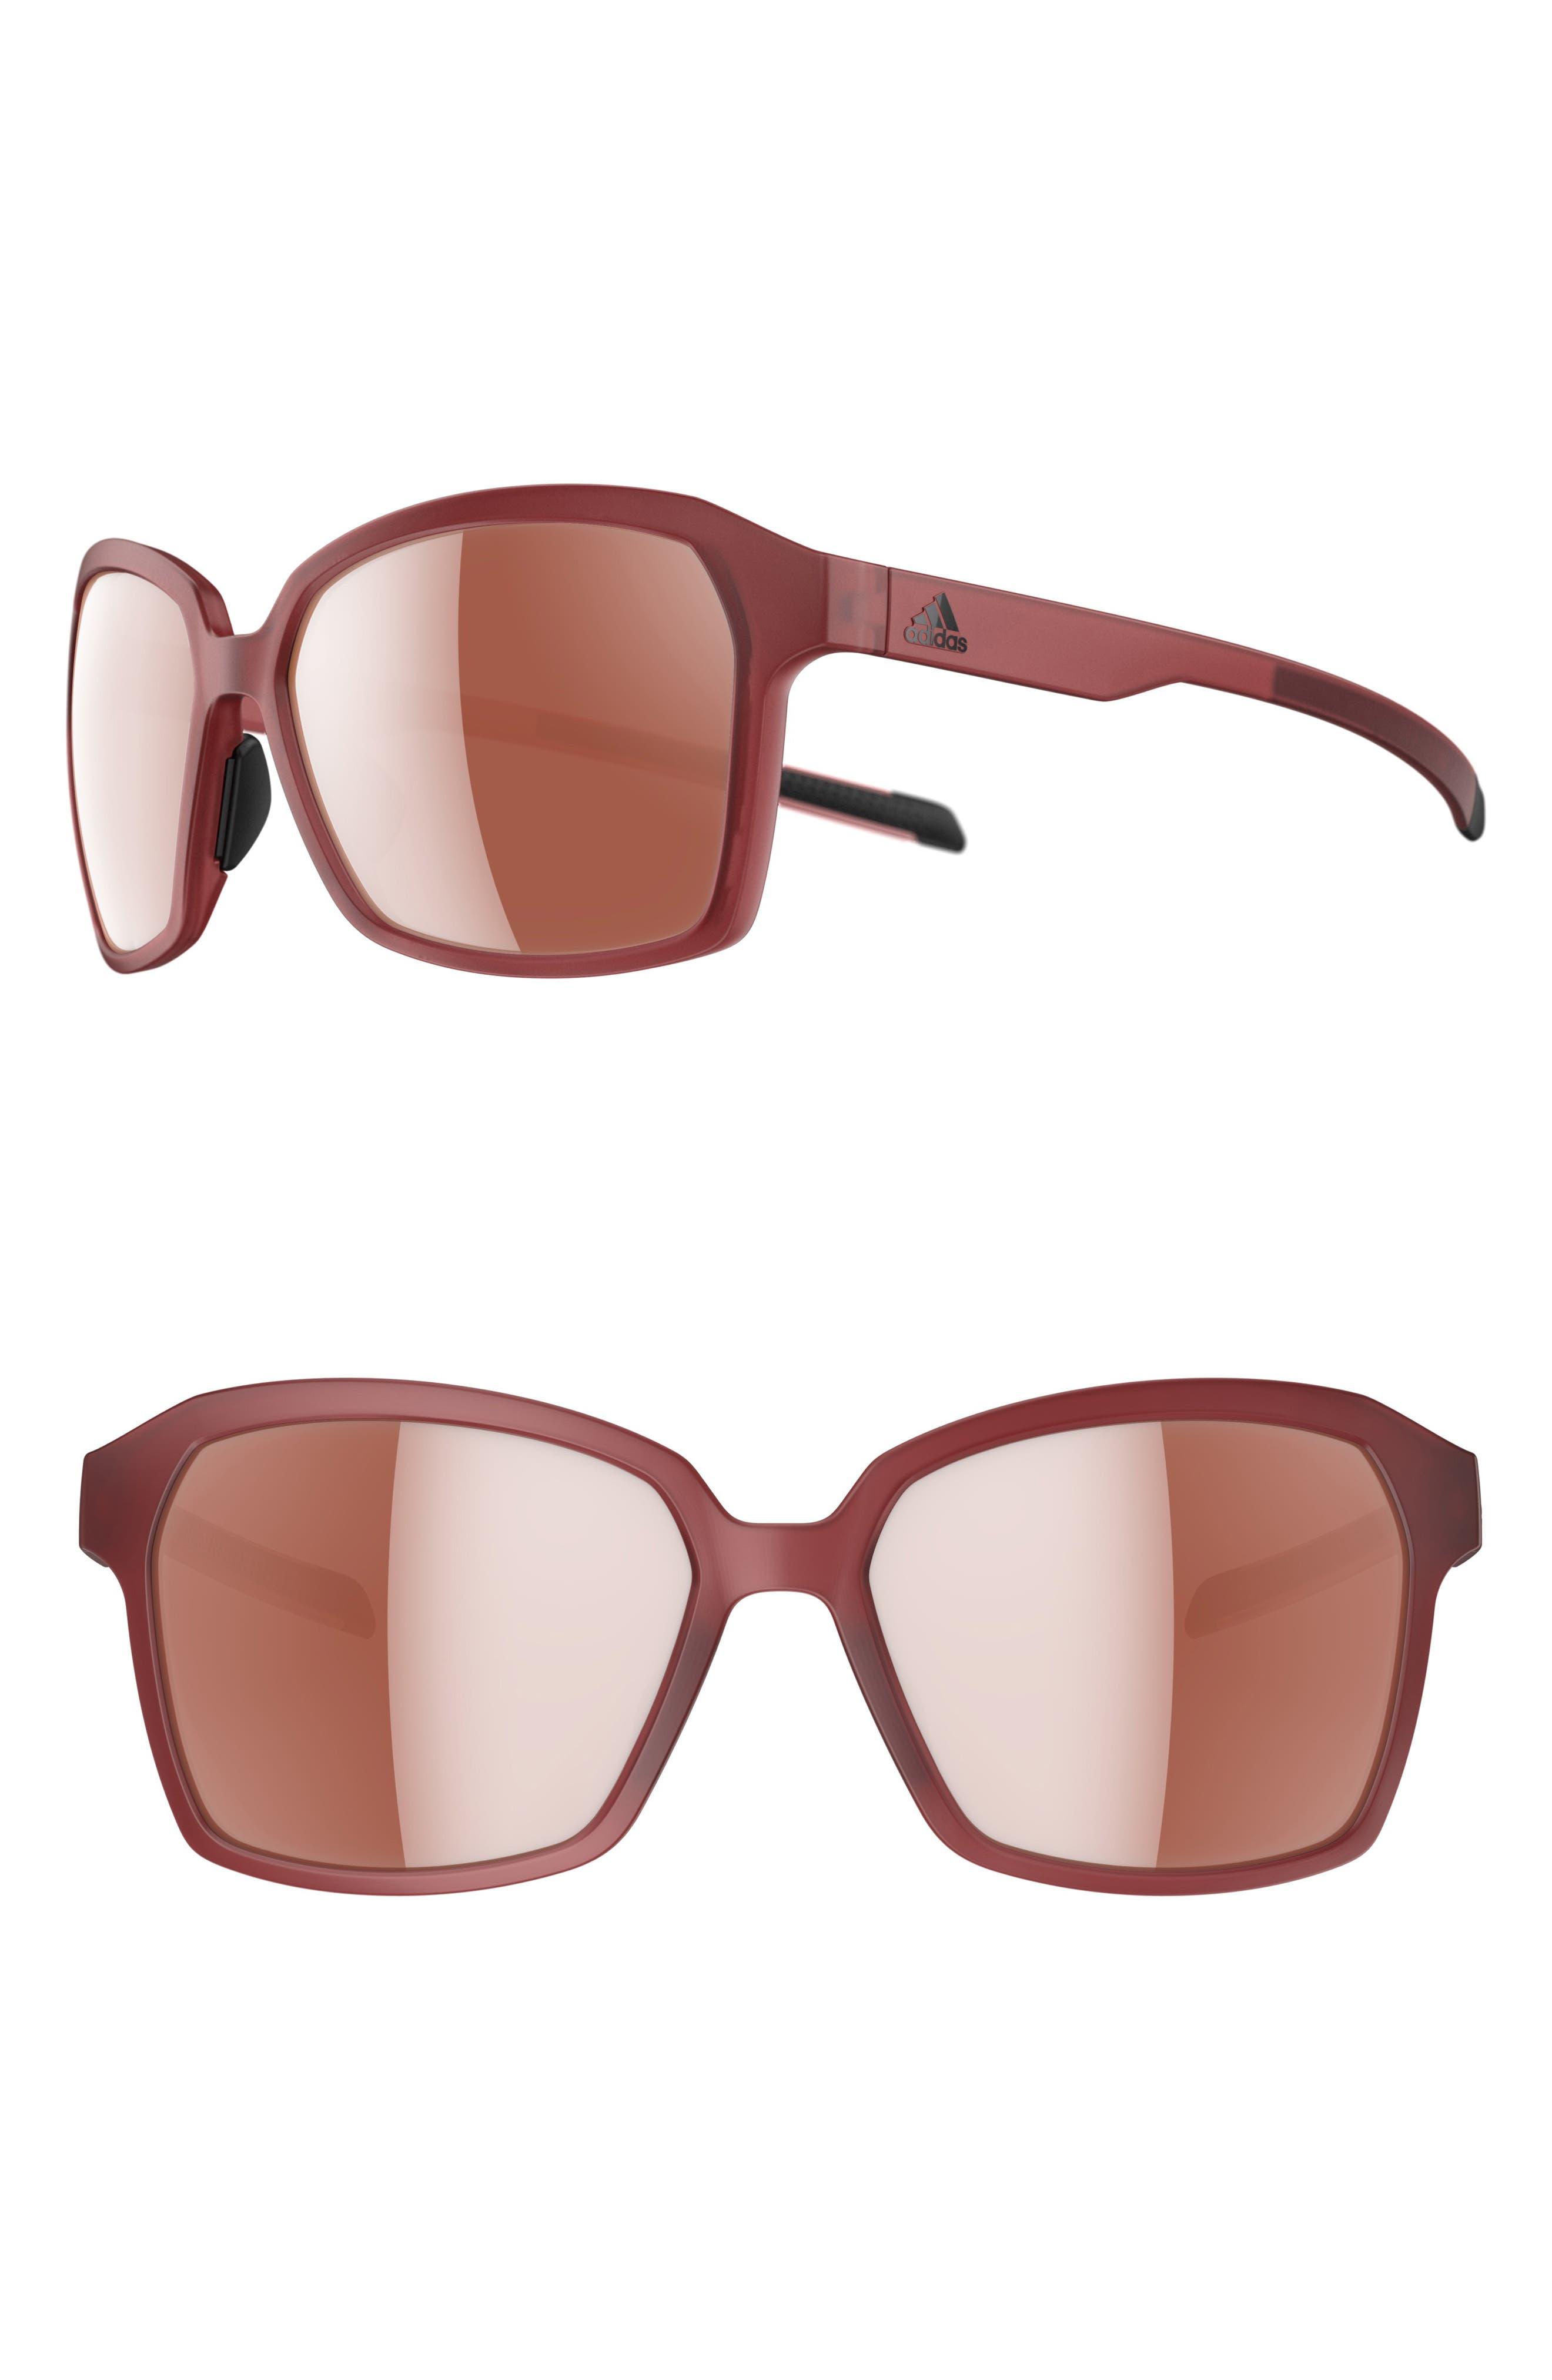 ADIDAS Aspyr Lst 58mm Sunglasses, Main, color, TRACE MAROON MATTE/SILVER